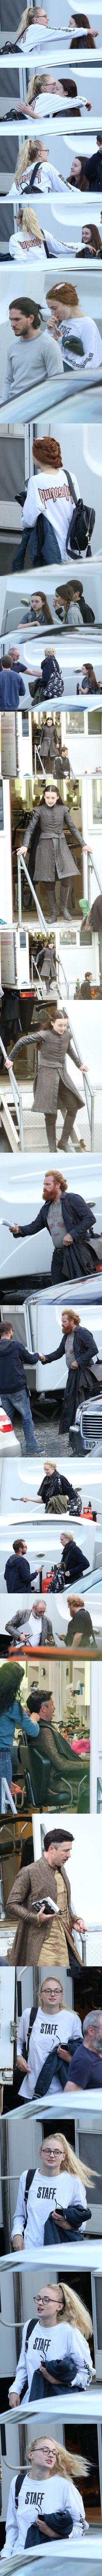 Game of Thrones season 7 set photos